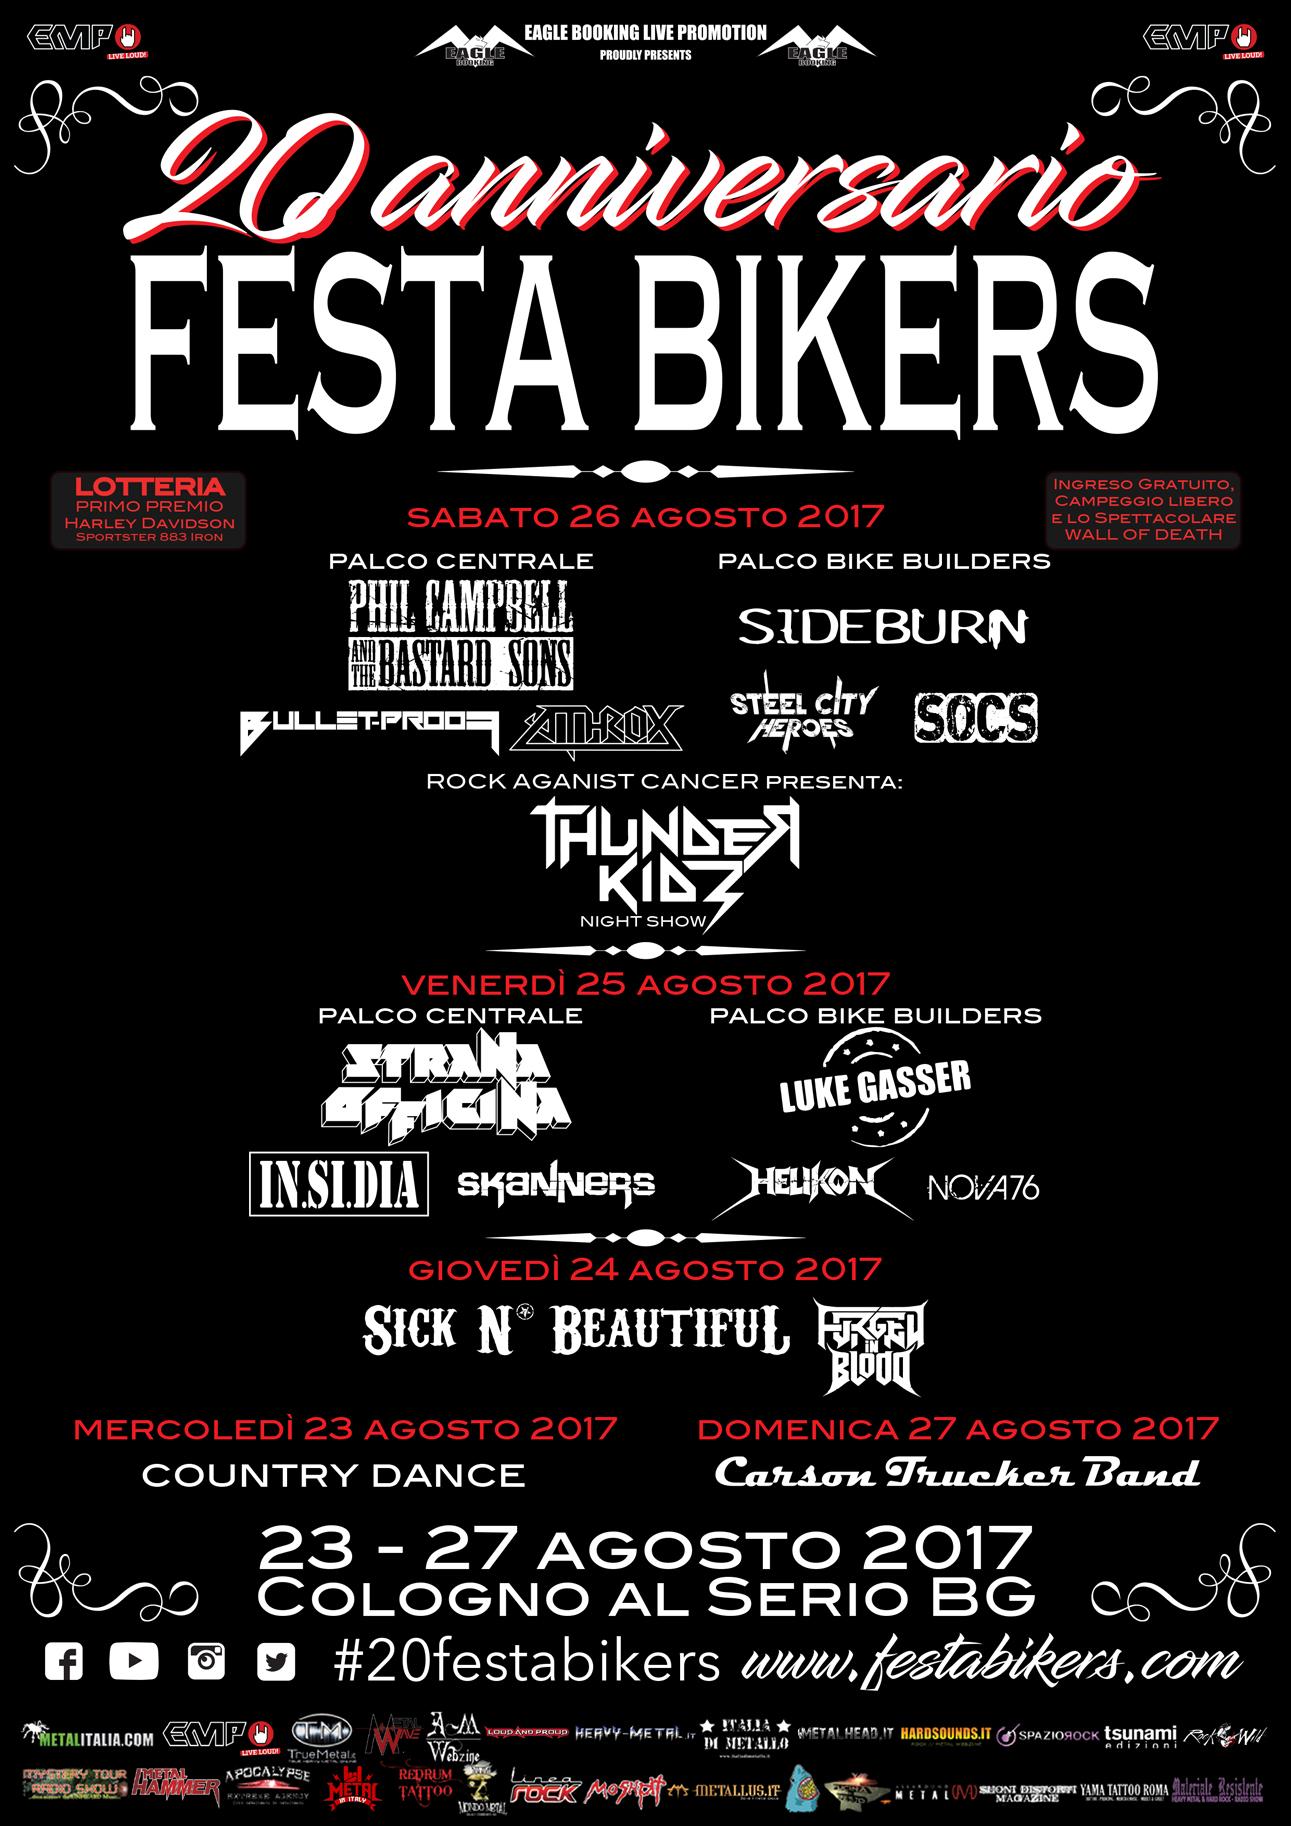 Festa Bikers - 20 Anniversario 2017 - Promo